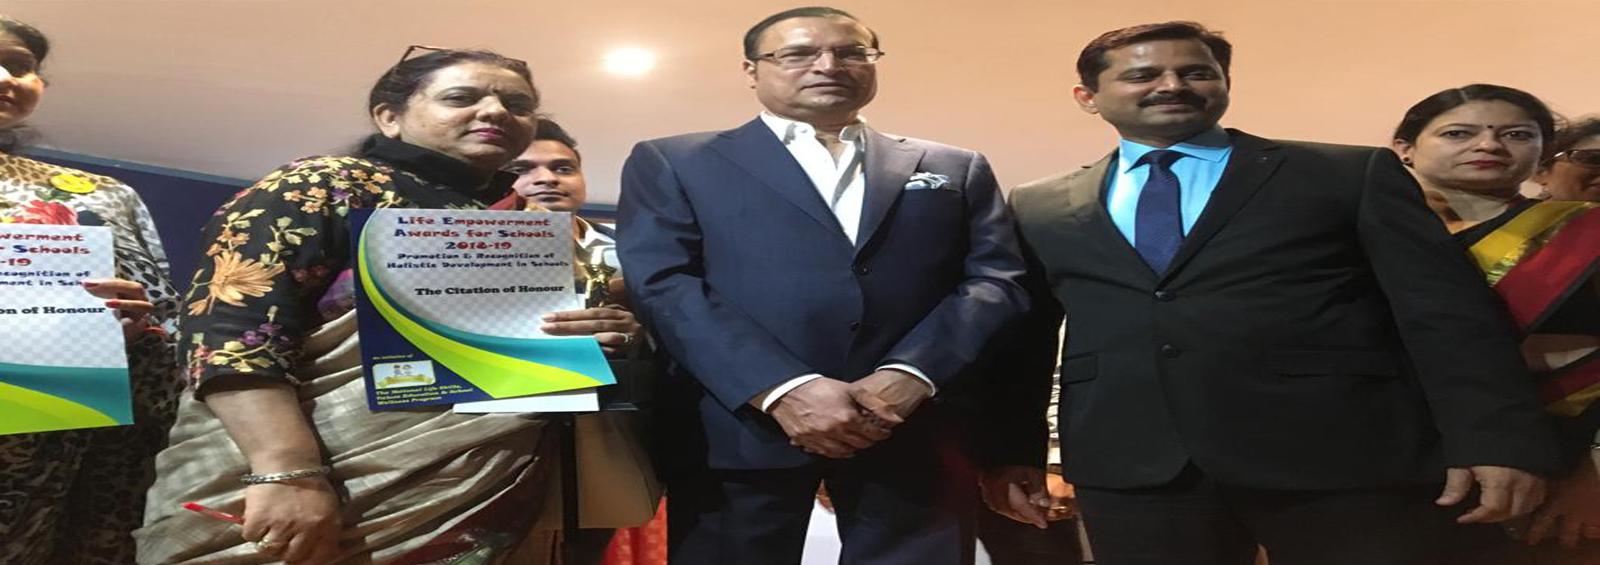 Life Empowerment Award 2018